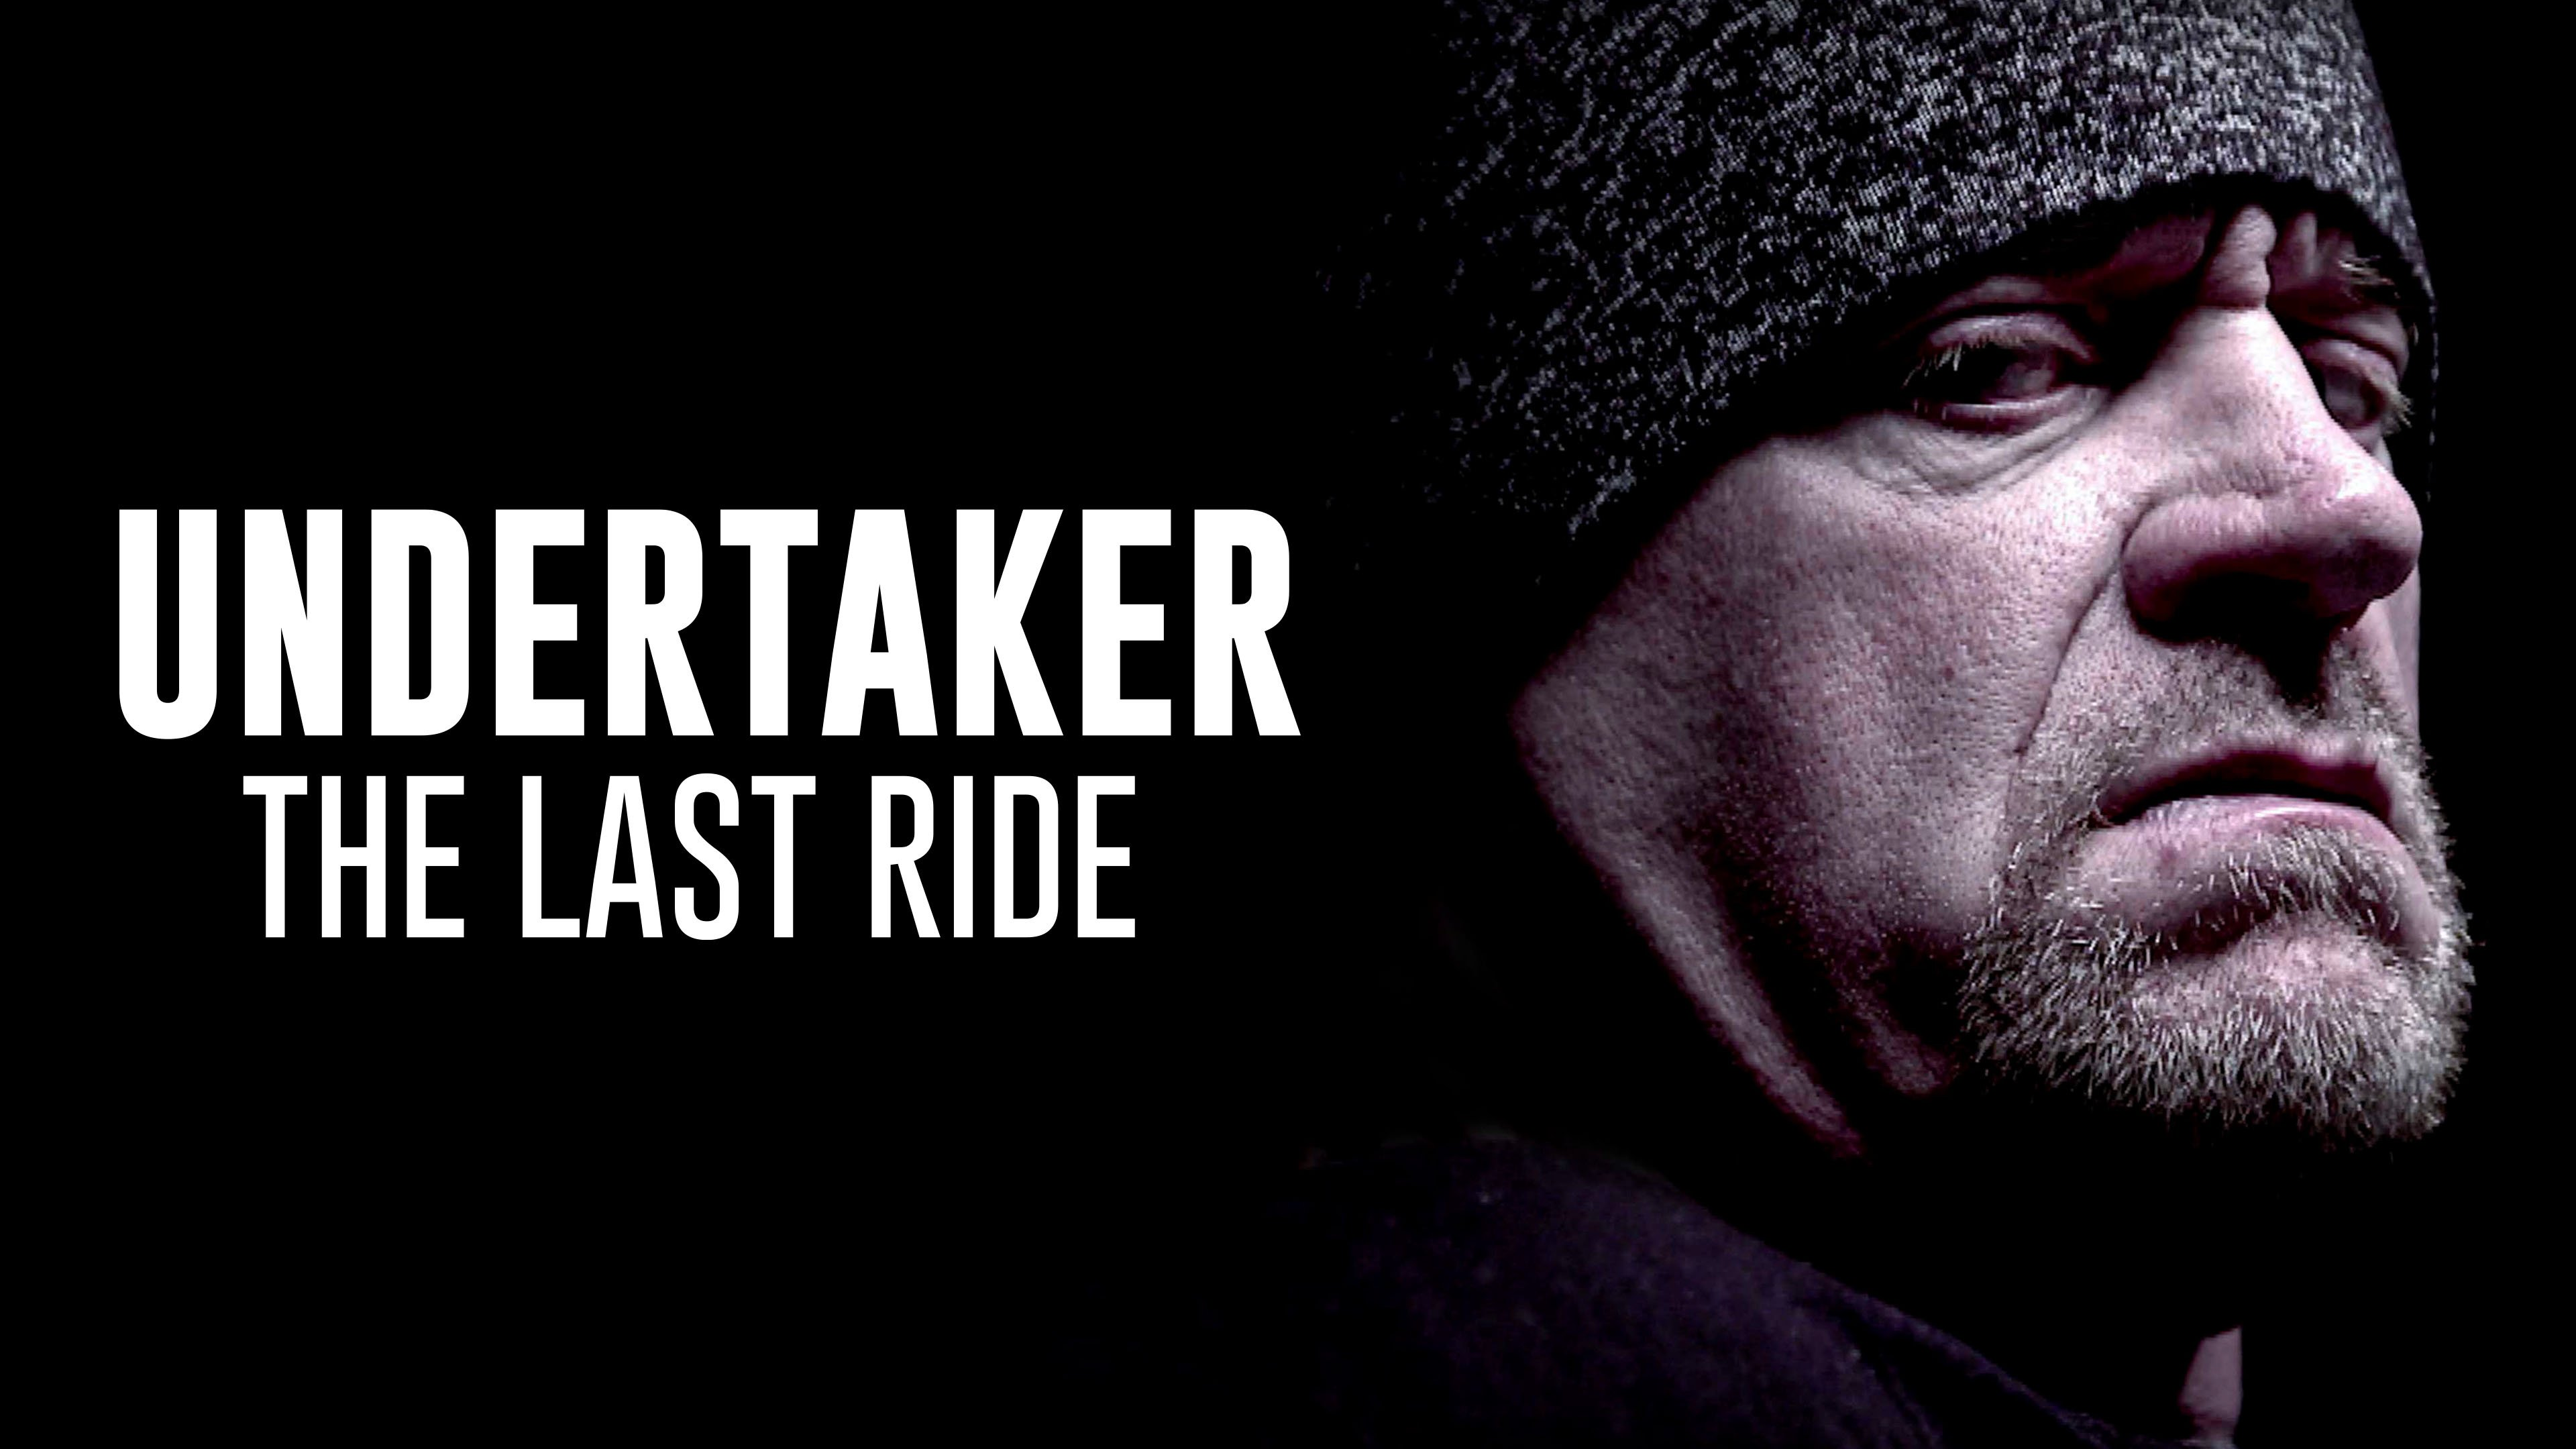 Undertaker: The Last Ride Bonus Episode Announced On WWE Network 1